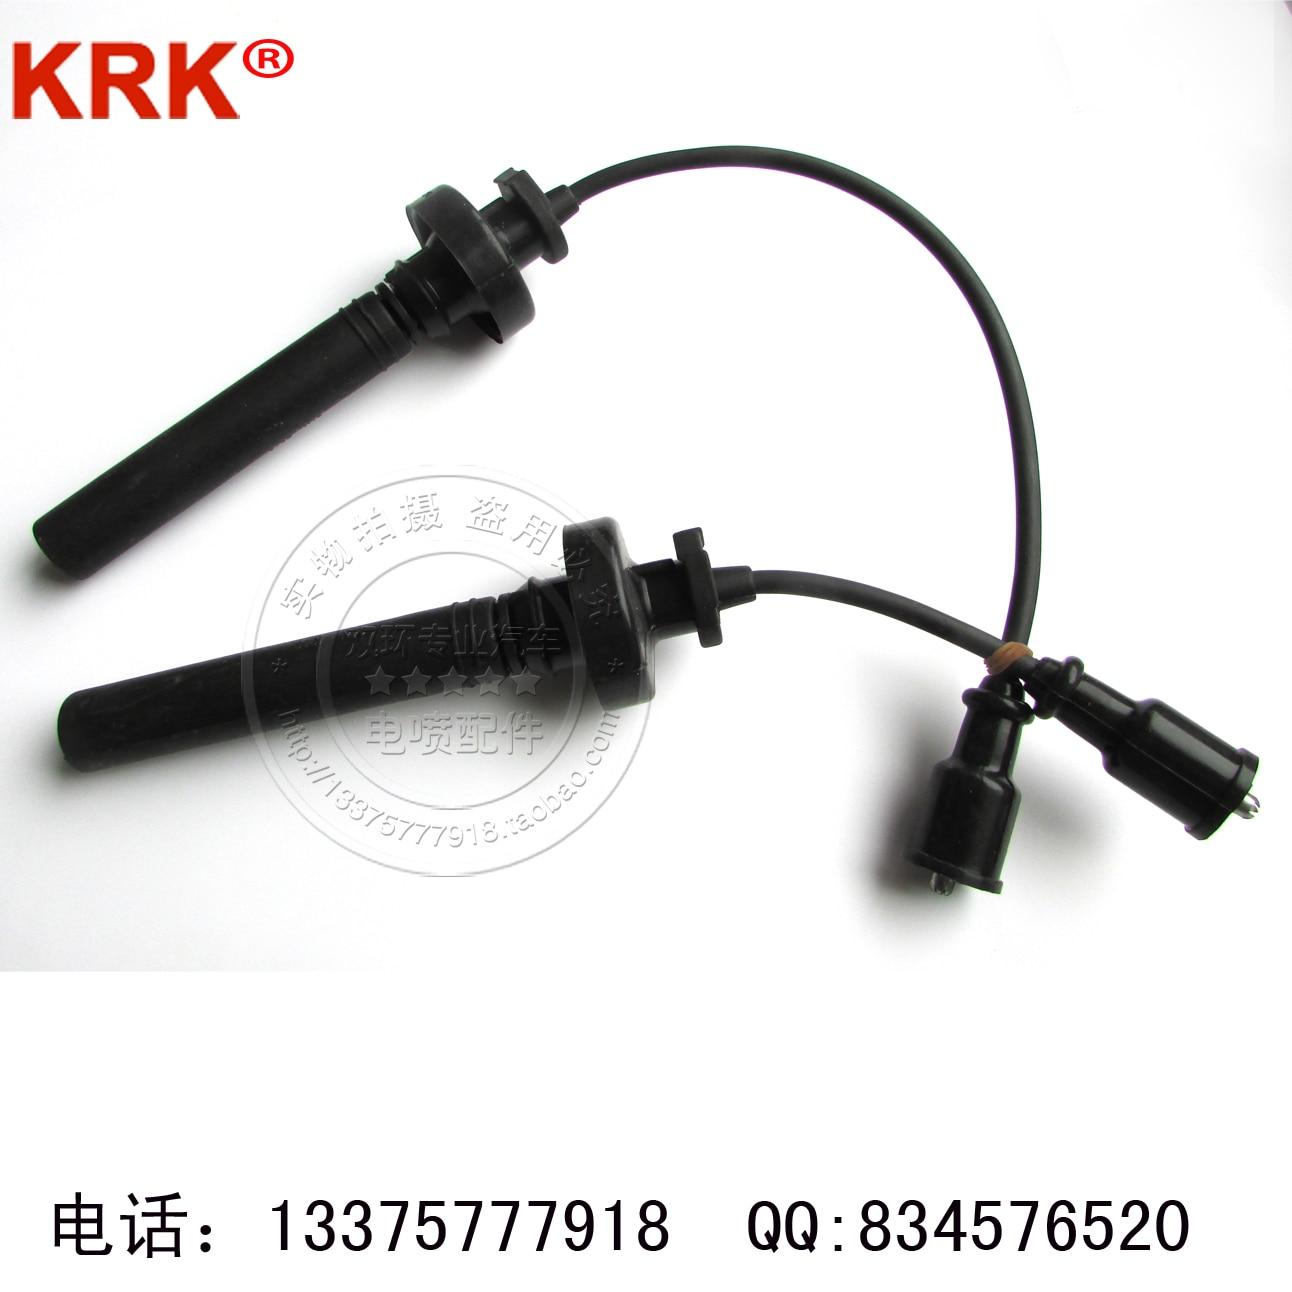 Entrega gratuita. Linha de sub-cilindro de alta tensão genuíno 4g1 krk